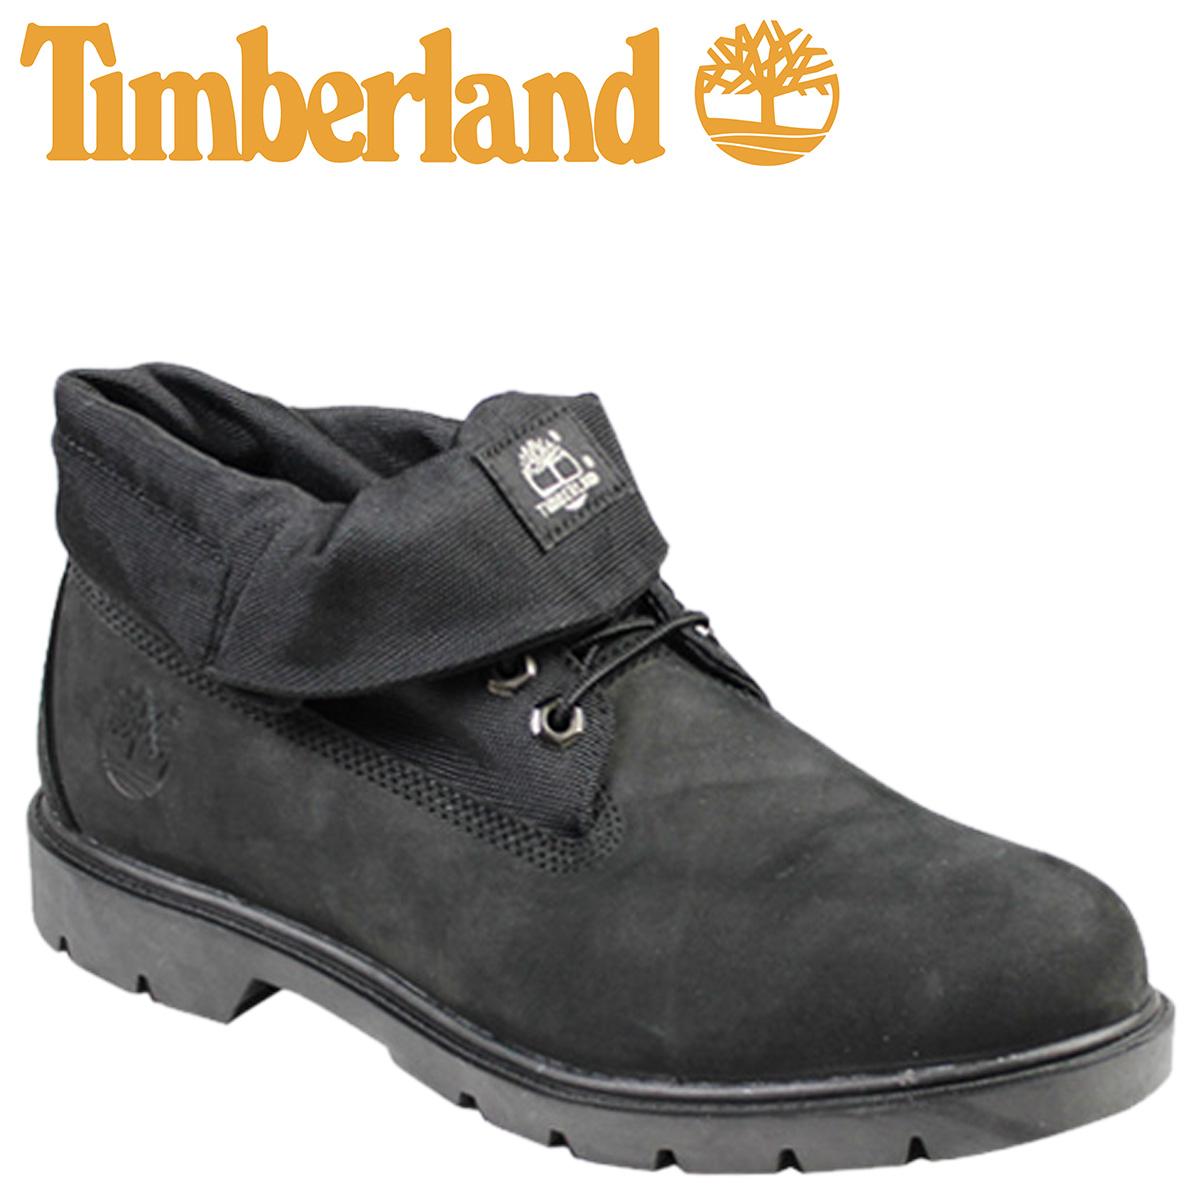 ALLSPORTS  Timberland Timberland basic roll top boots BASIC ROLL TOP BOOTS  M wise leather men s work boots 6635A black  12   3 new stock   regular  ... 58ac1b1ef58